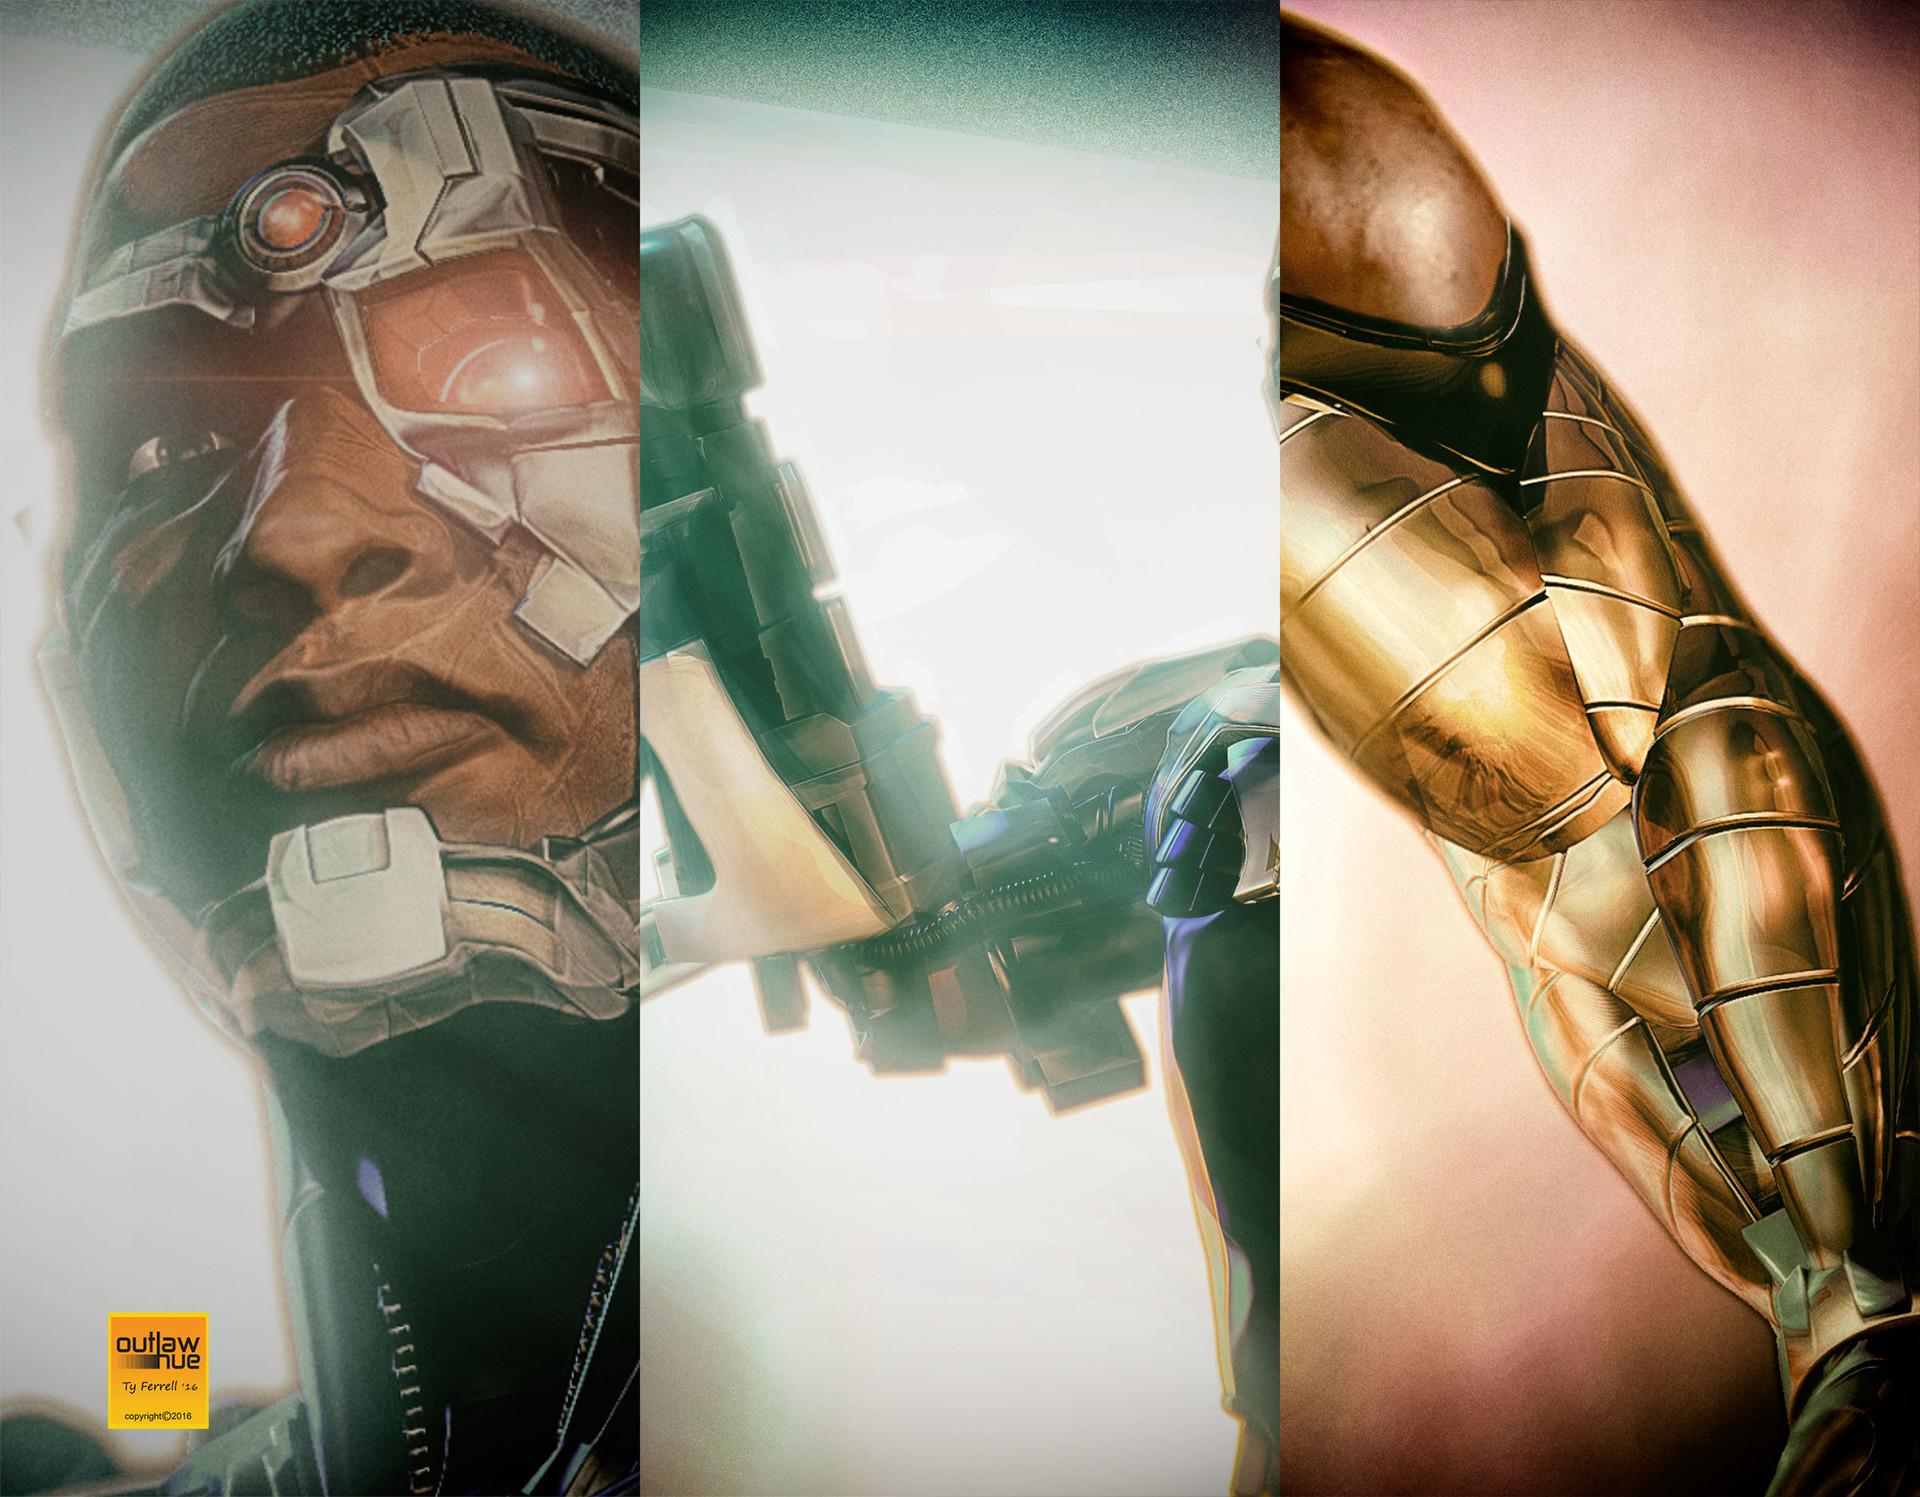 Ty ferrell cyborgproc1